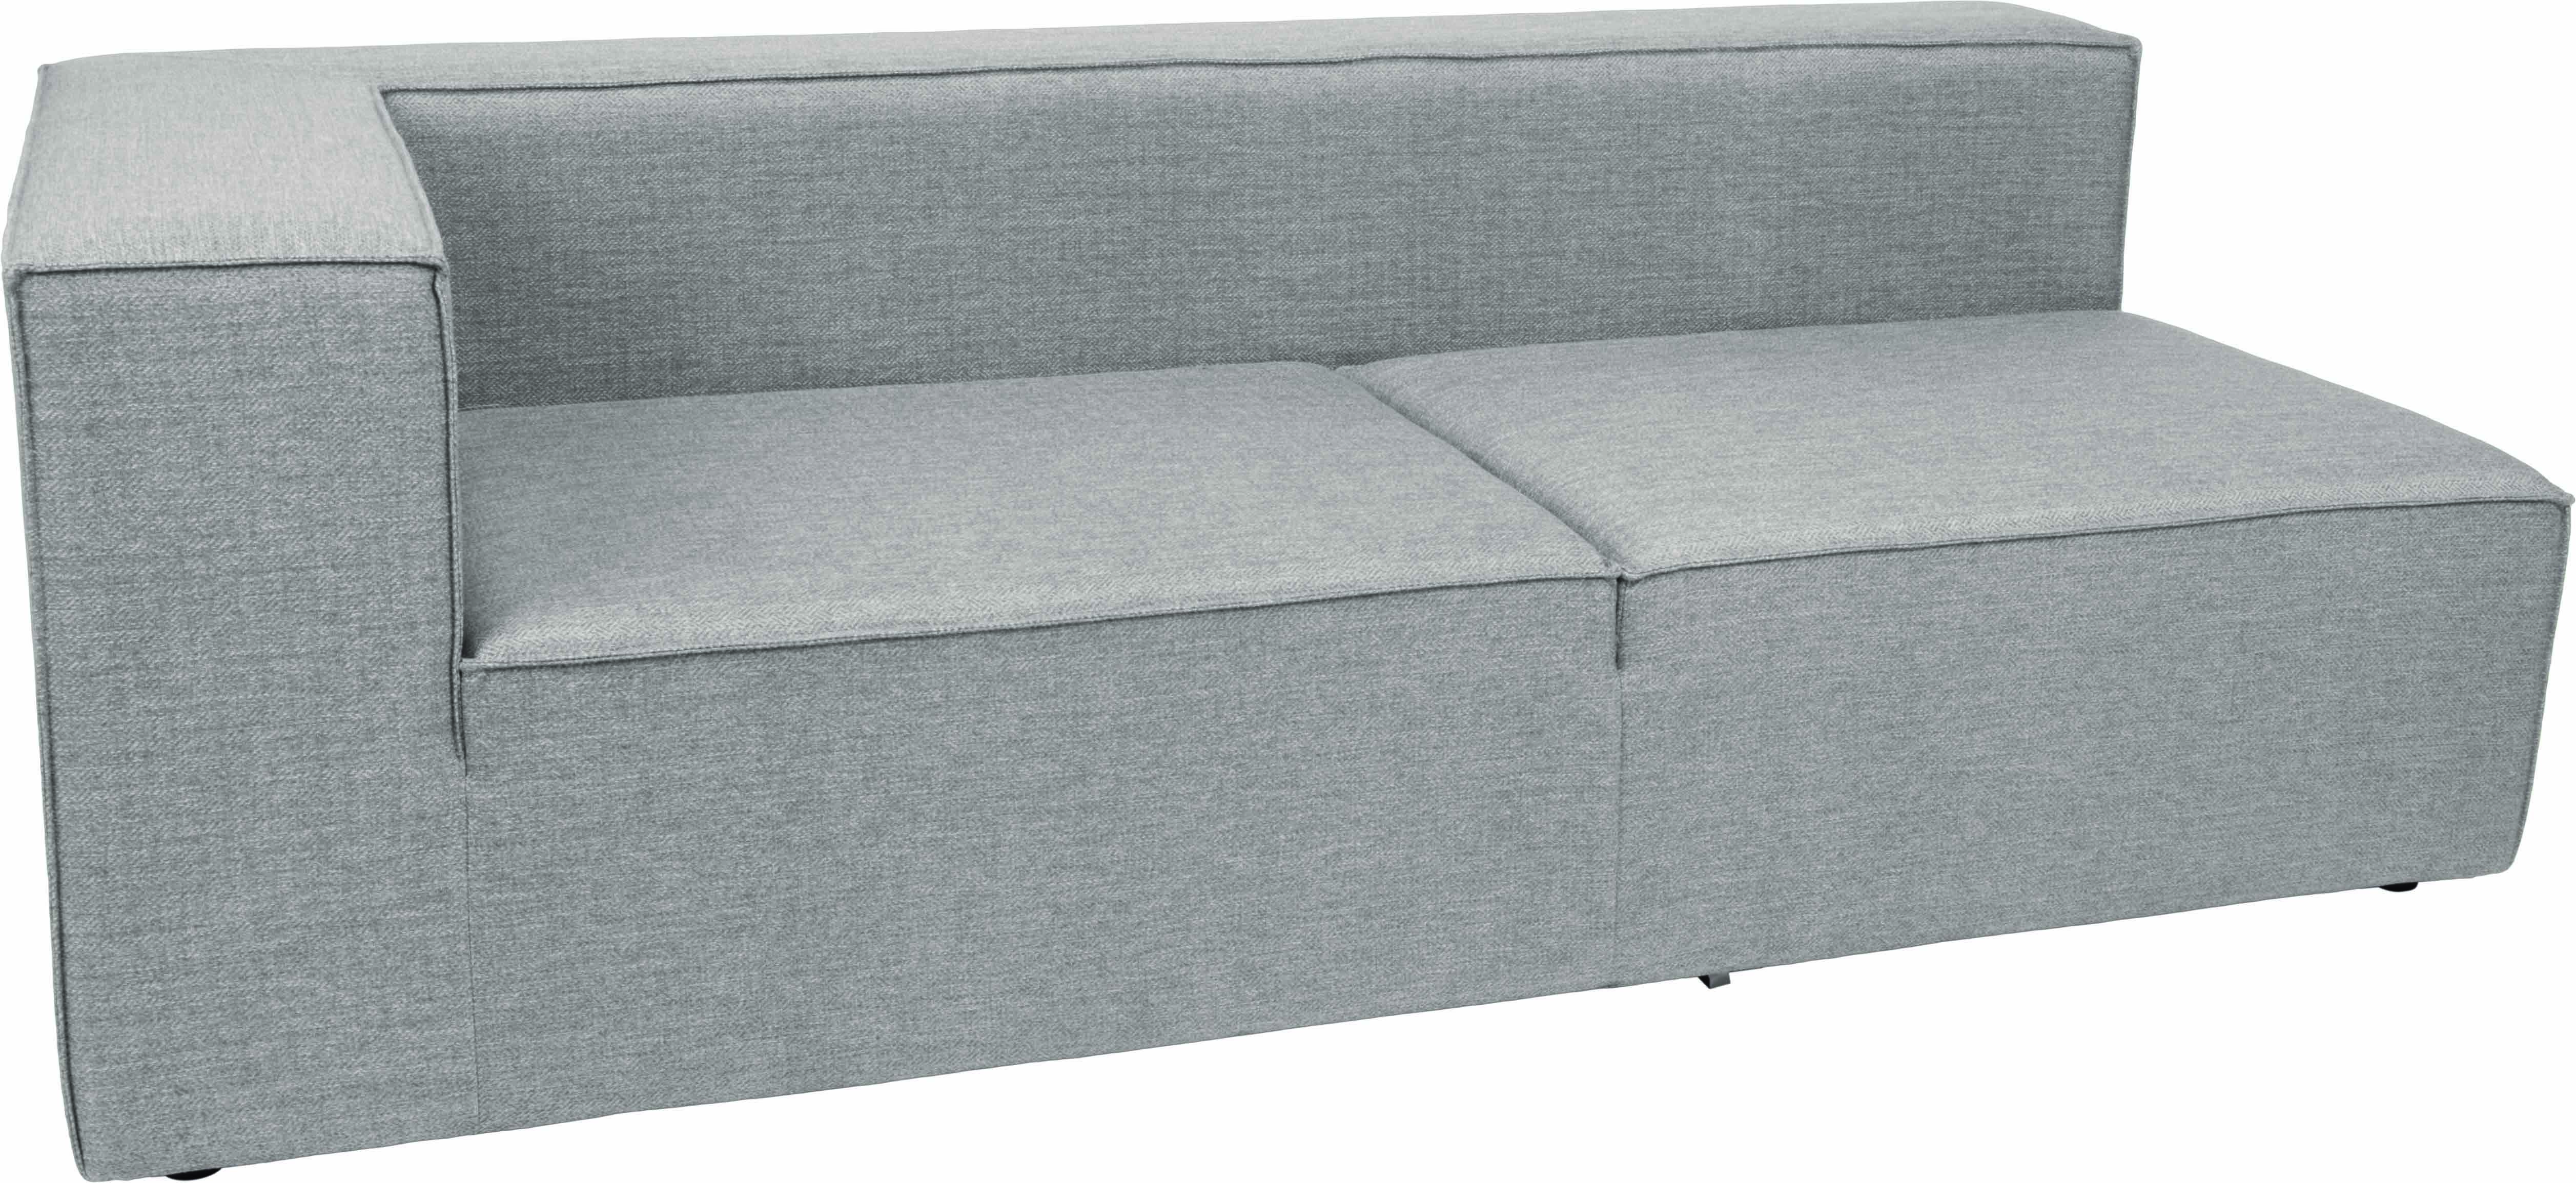 Adele Sectional Sofa Berg Stock